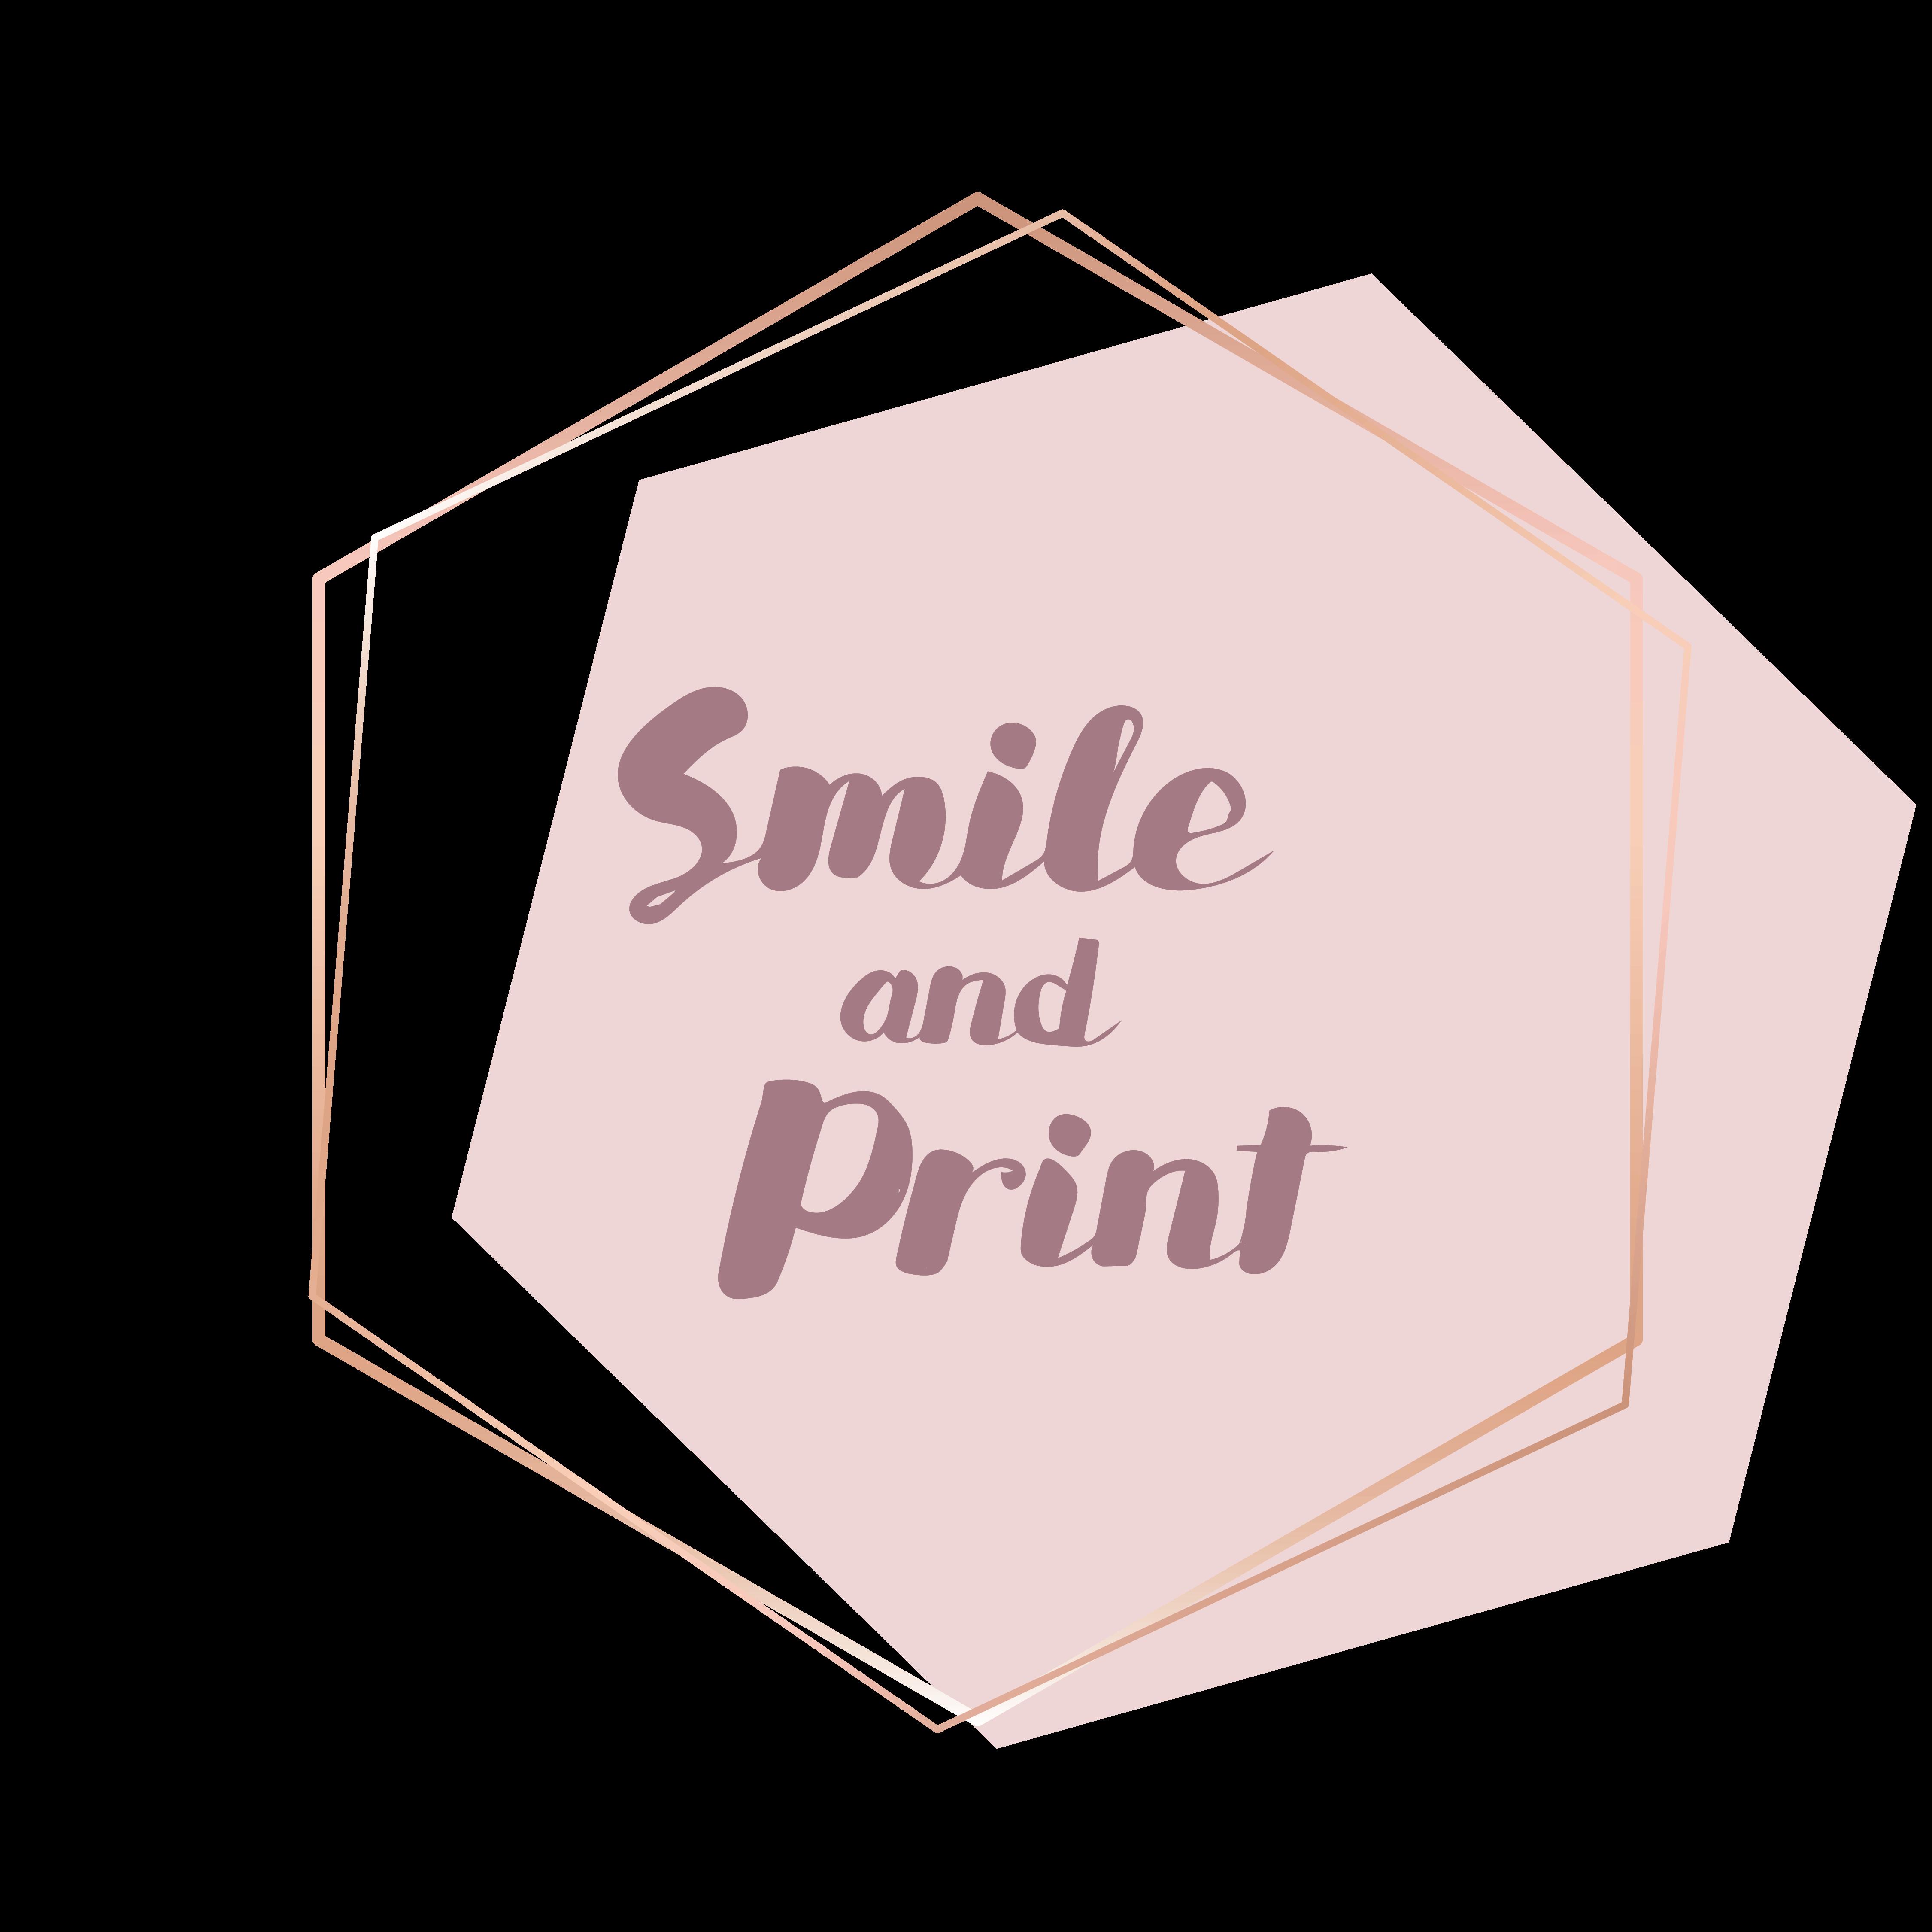 Smile and Print